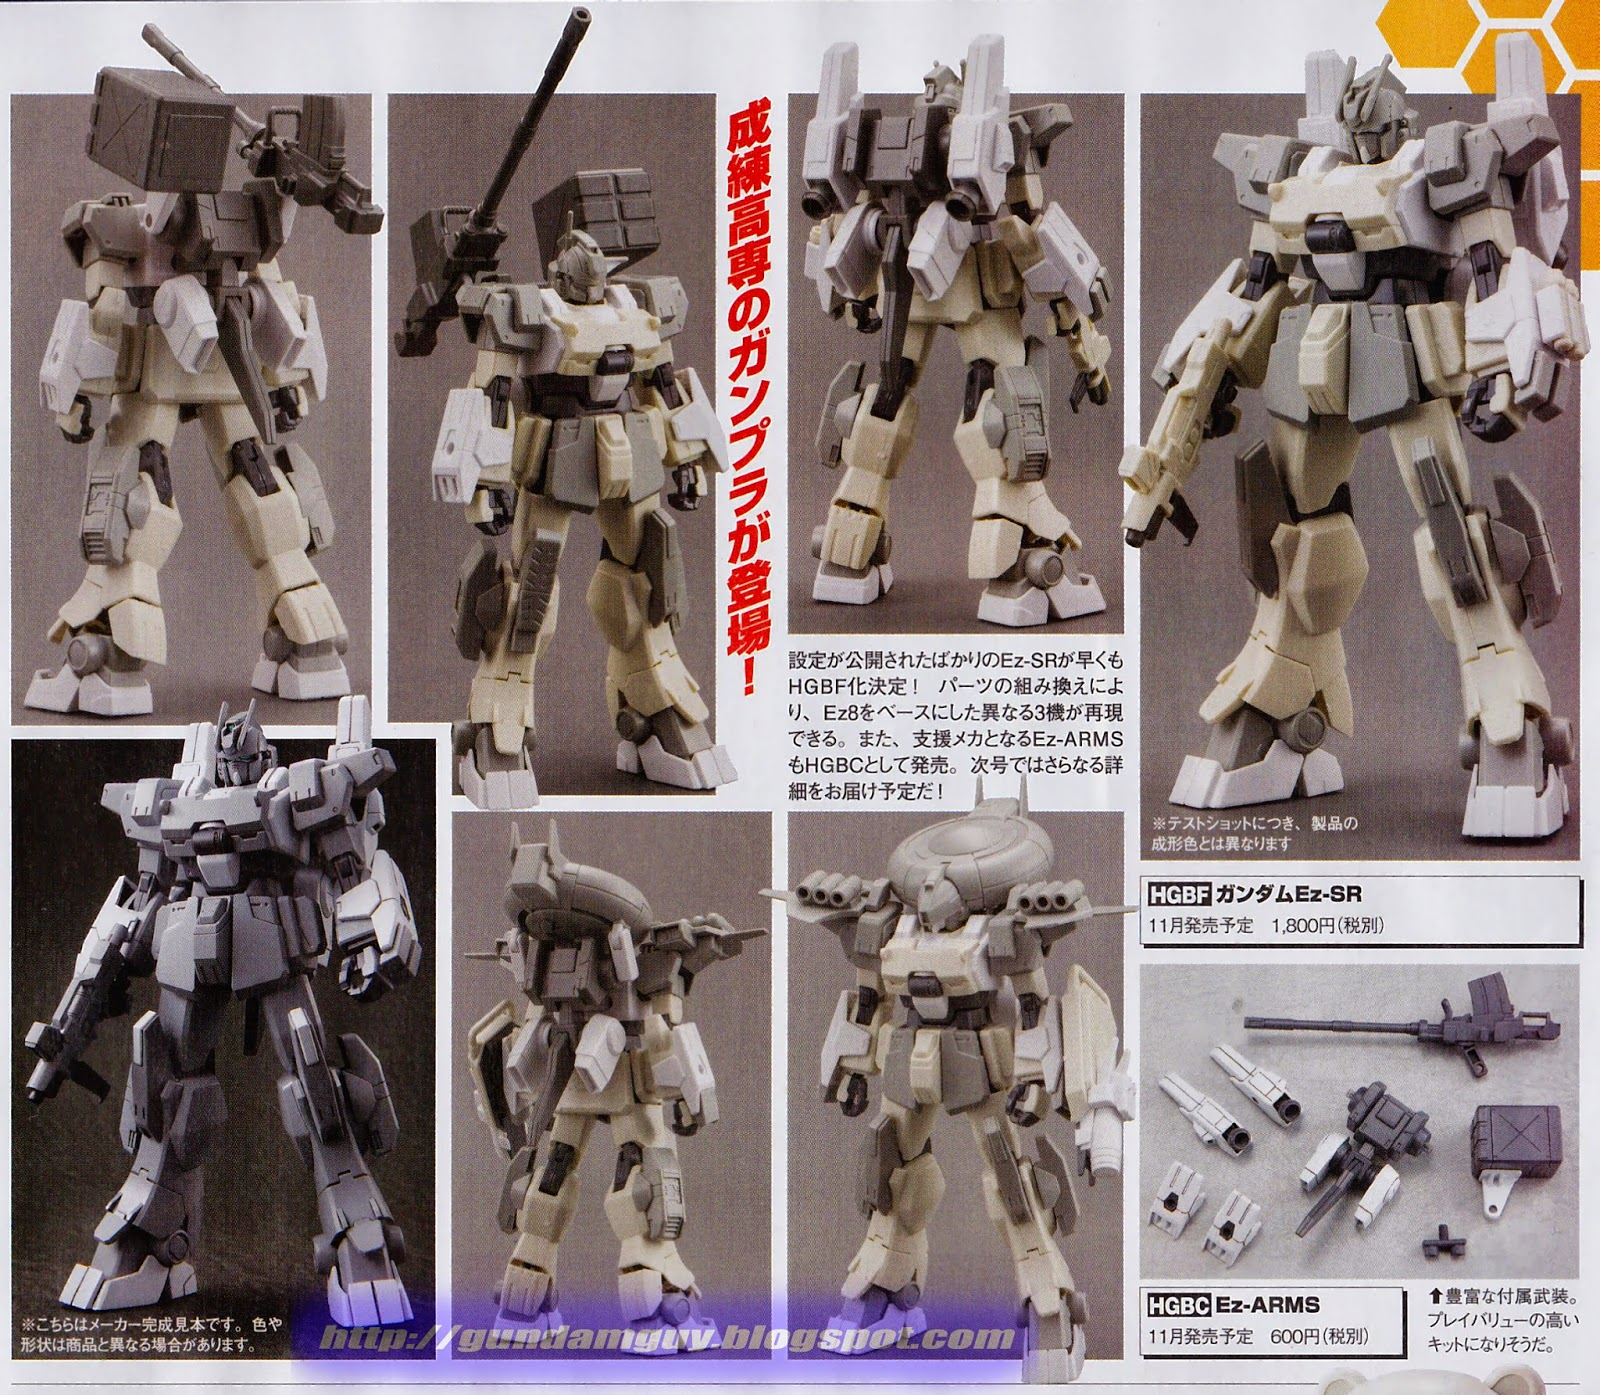 Re: กันพลาเดือน 11/2014: HG Lightning Gundam, HG Lightning BWS, HG Montero, HG G-Arcane, HG Crossbone X1, HG Beargguy F, HG Ez-SR